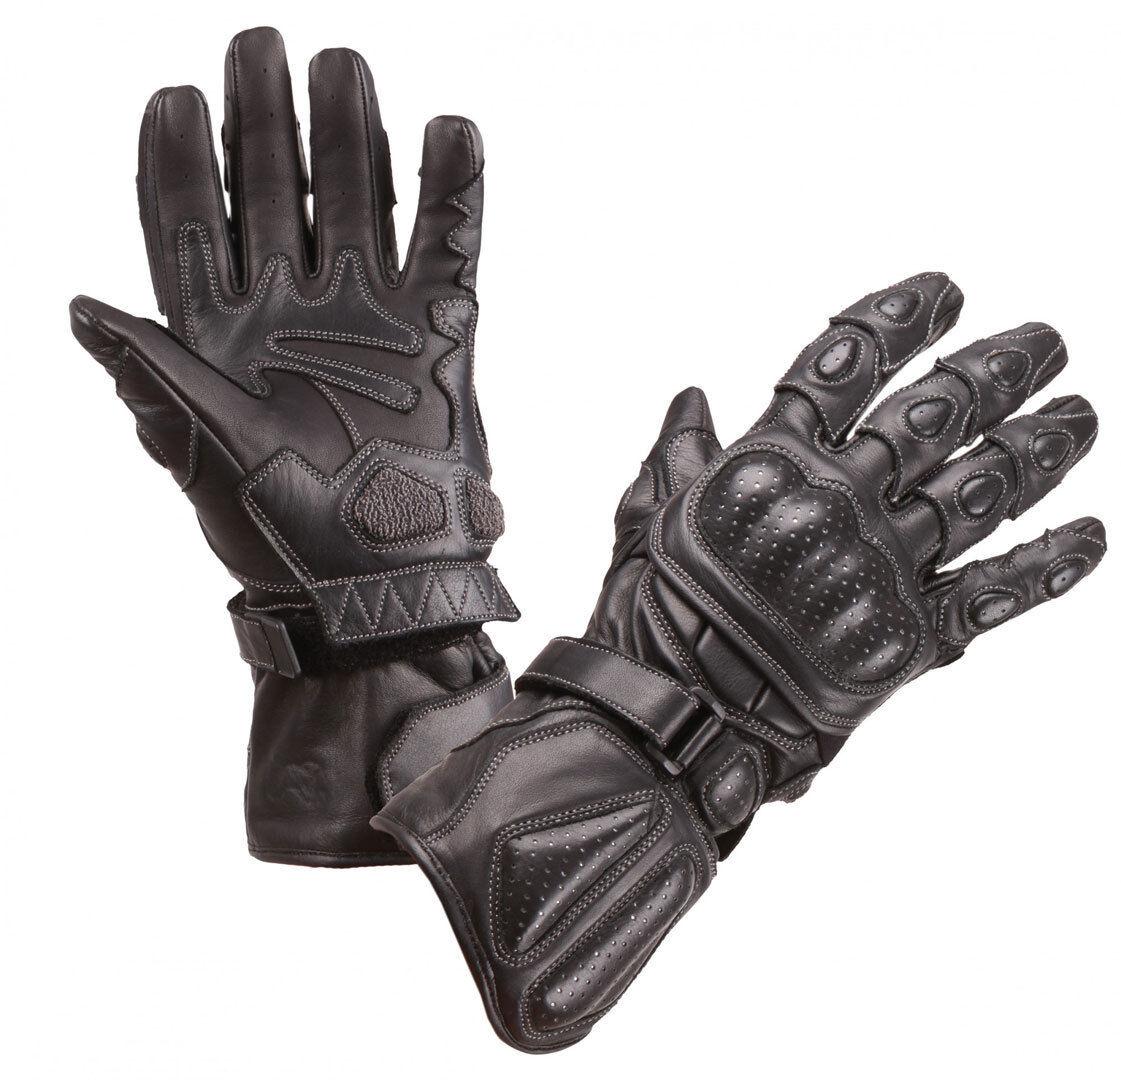 Modeka Racing Pro Motorcycle Gloves Black L